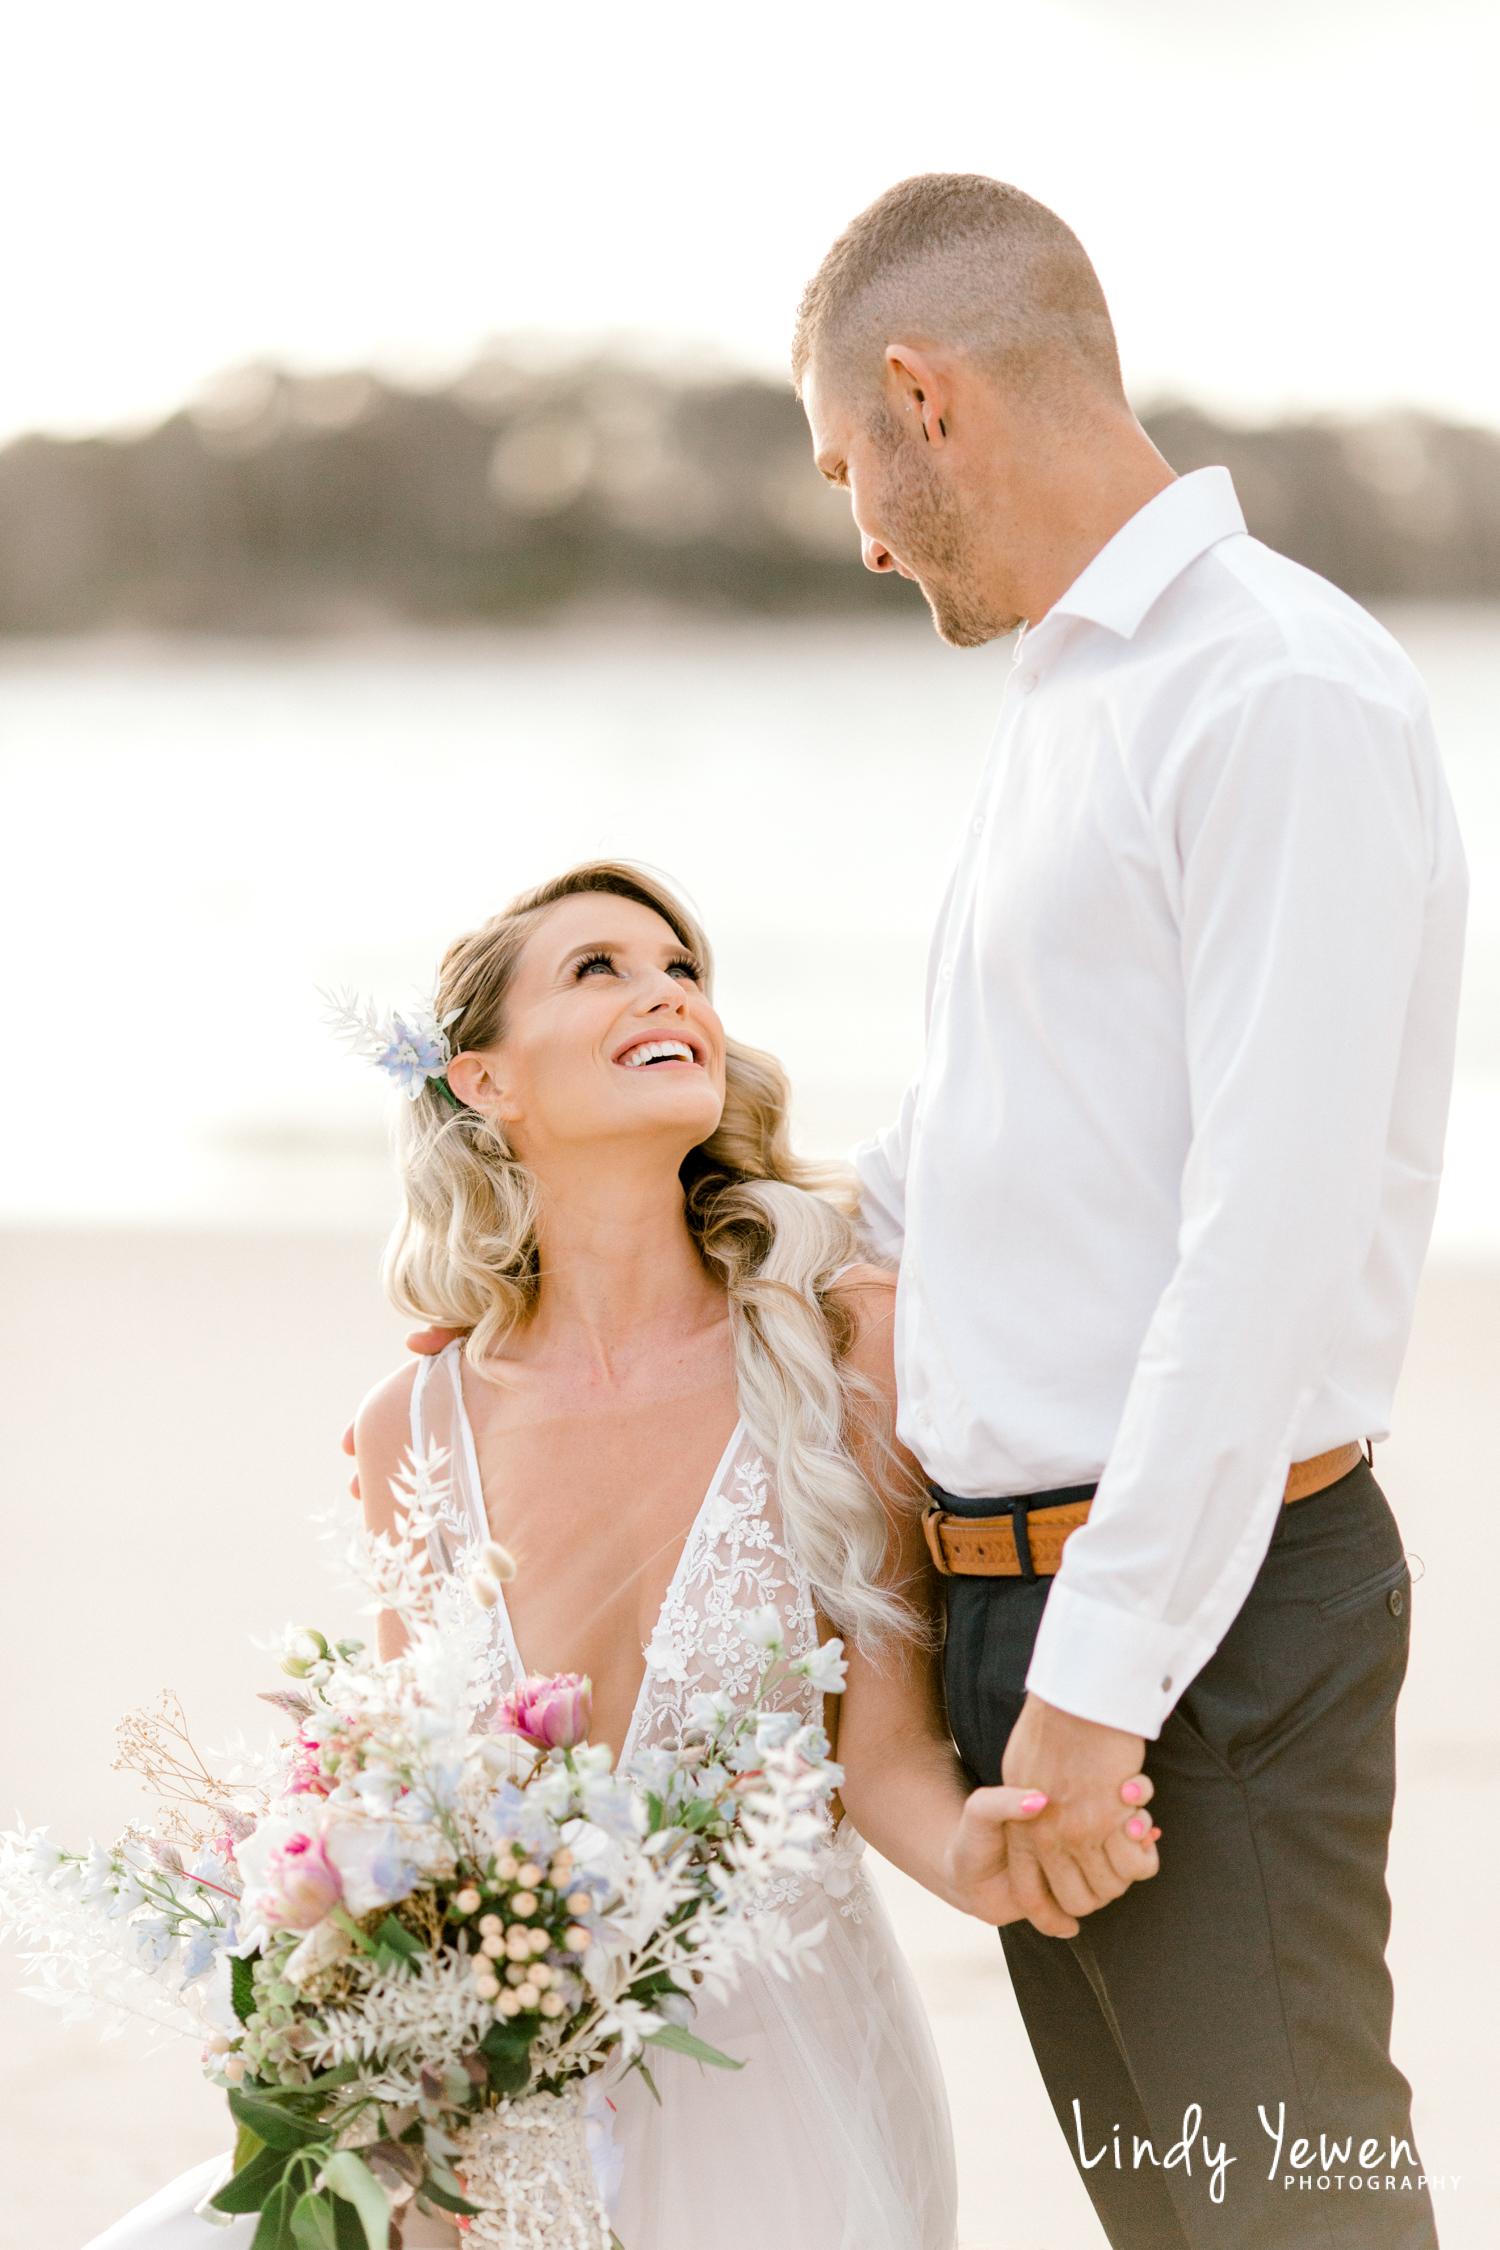 Lindy-Photography-Noosa-Weddings-Grace-Chris 64.jpg